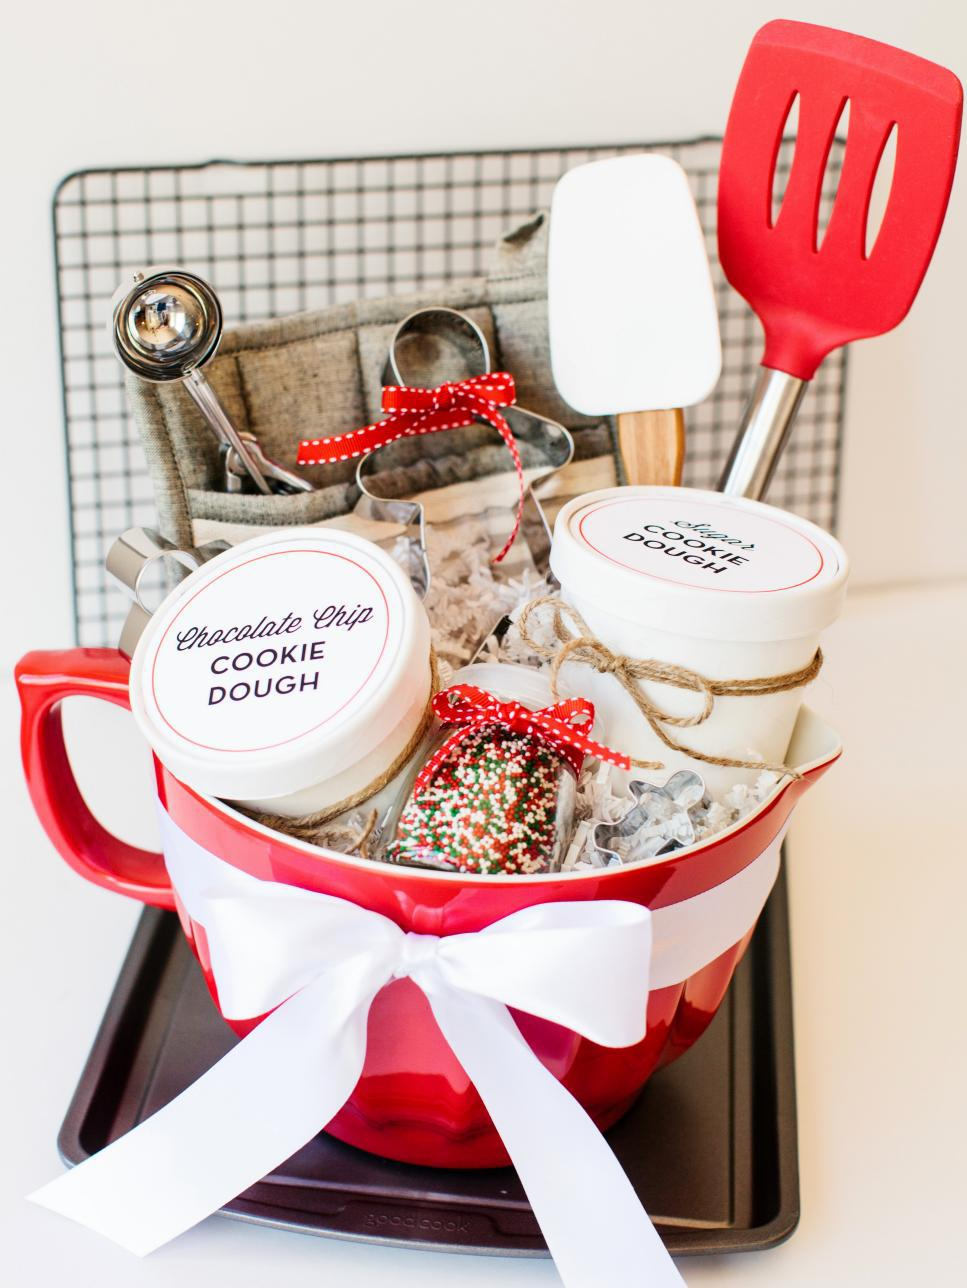 ci-rennai-hoefer_cookie-dough-gift-basket_v-jpg-rend-hgtvcom-966-1288